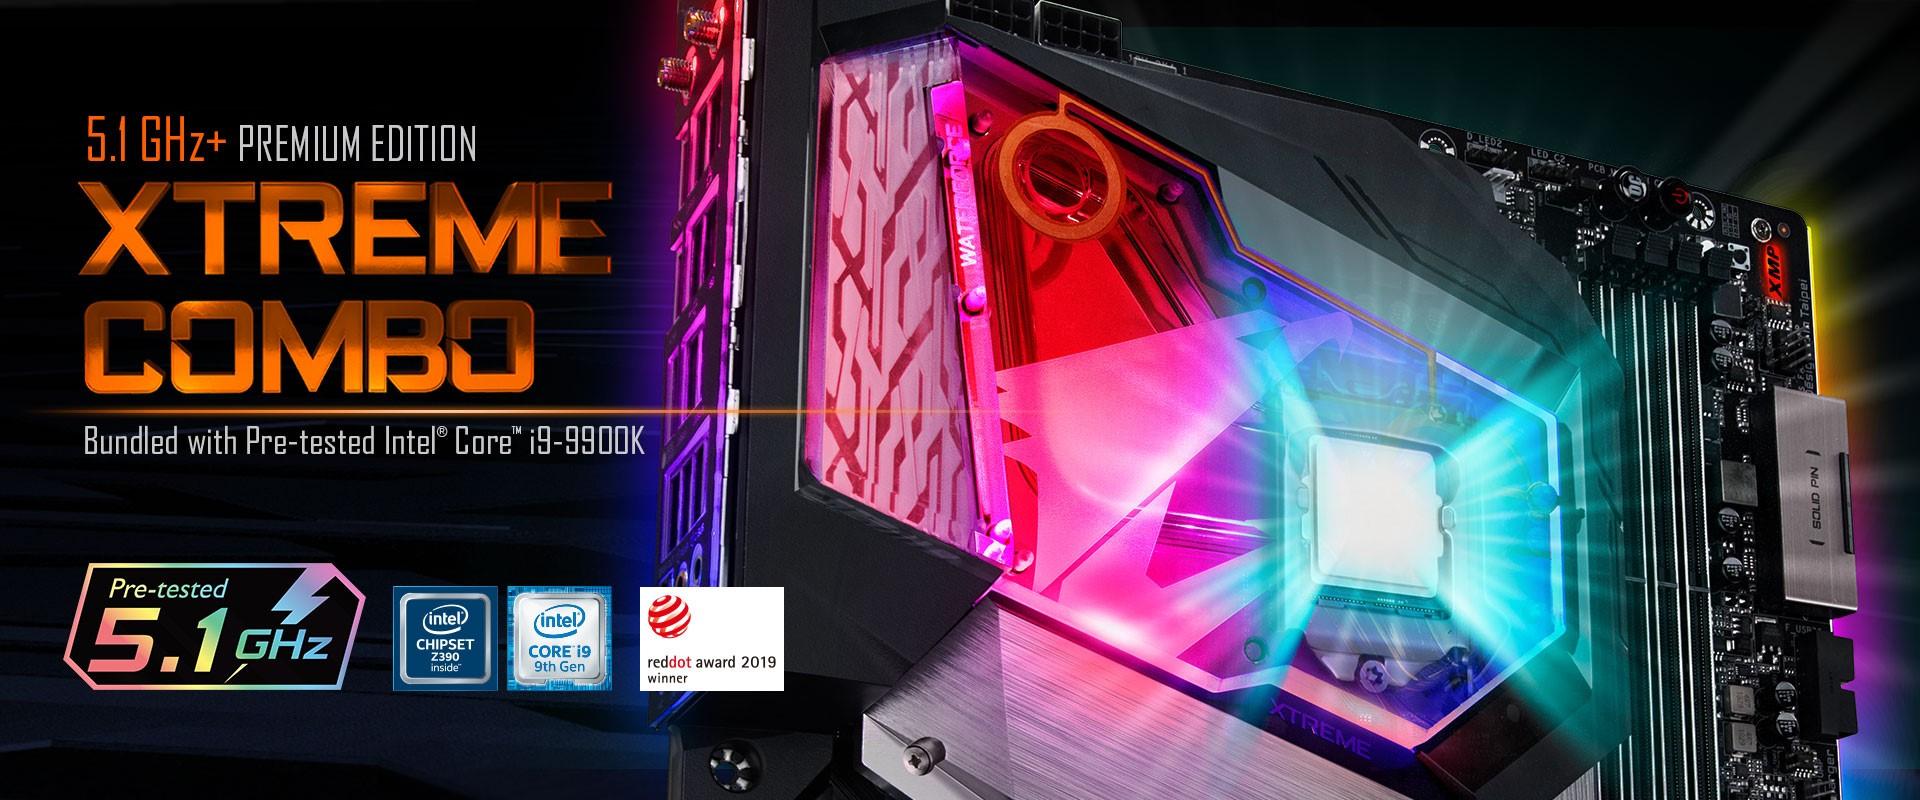 GIGABYTE Launches Z390 AORUS XTREME WATERFORCE 5G Premium